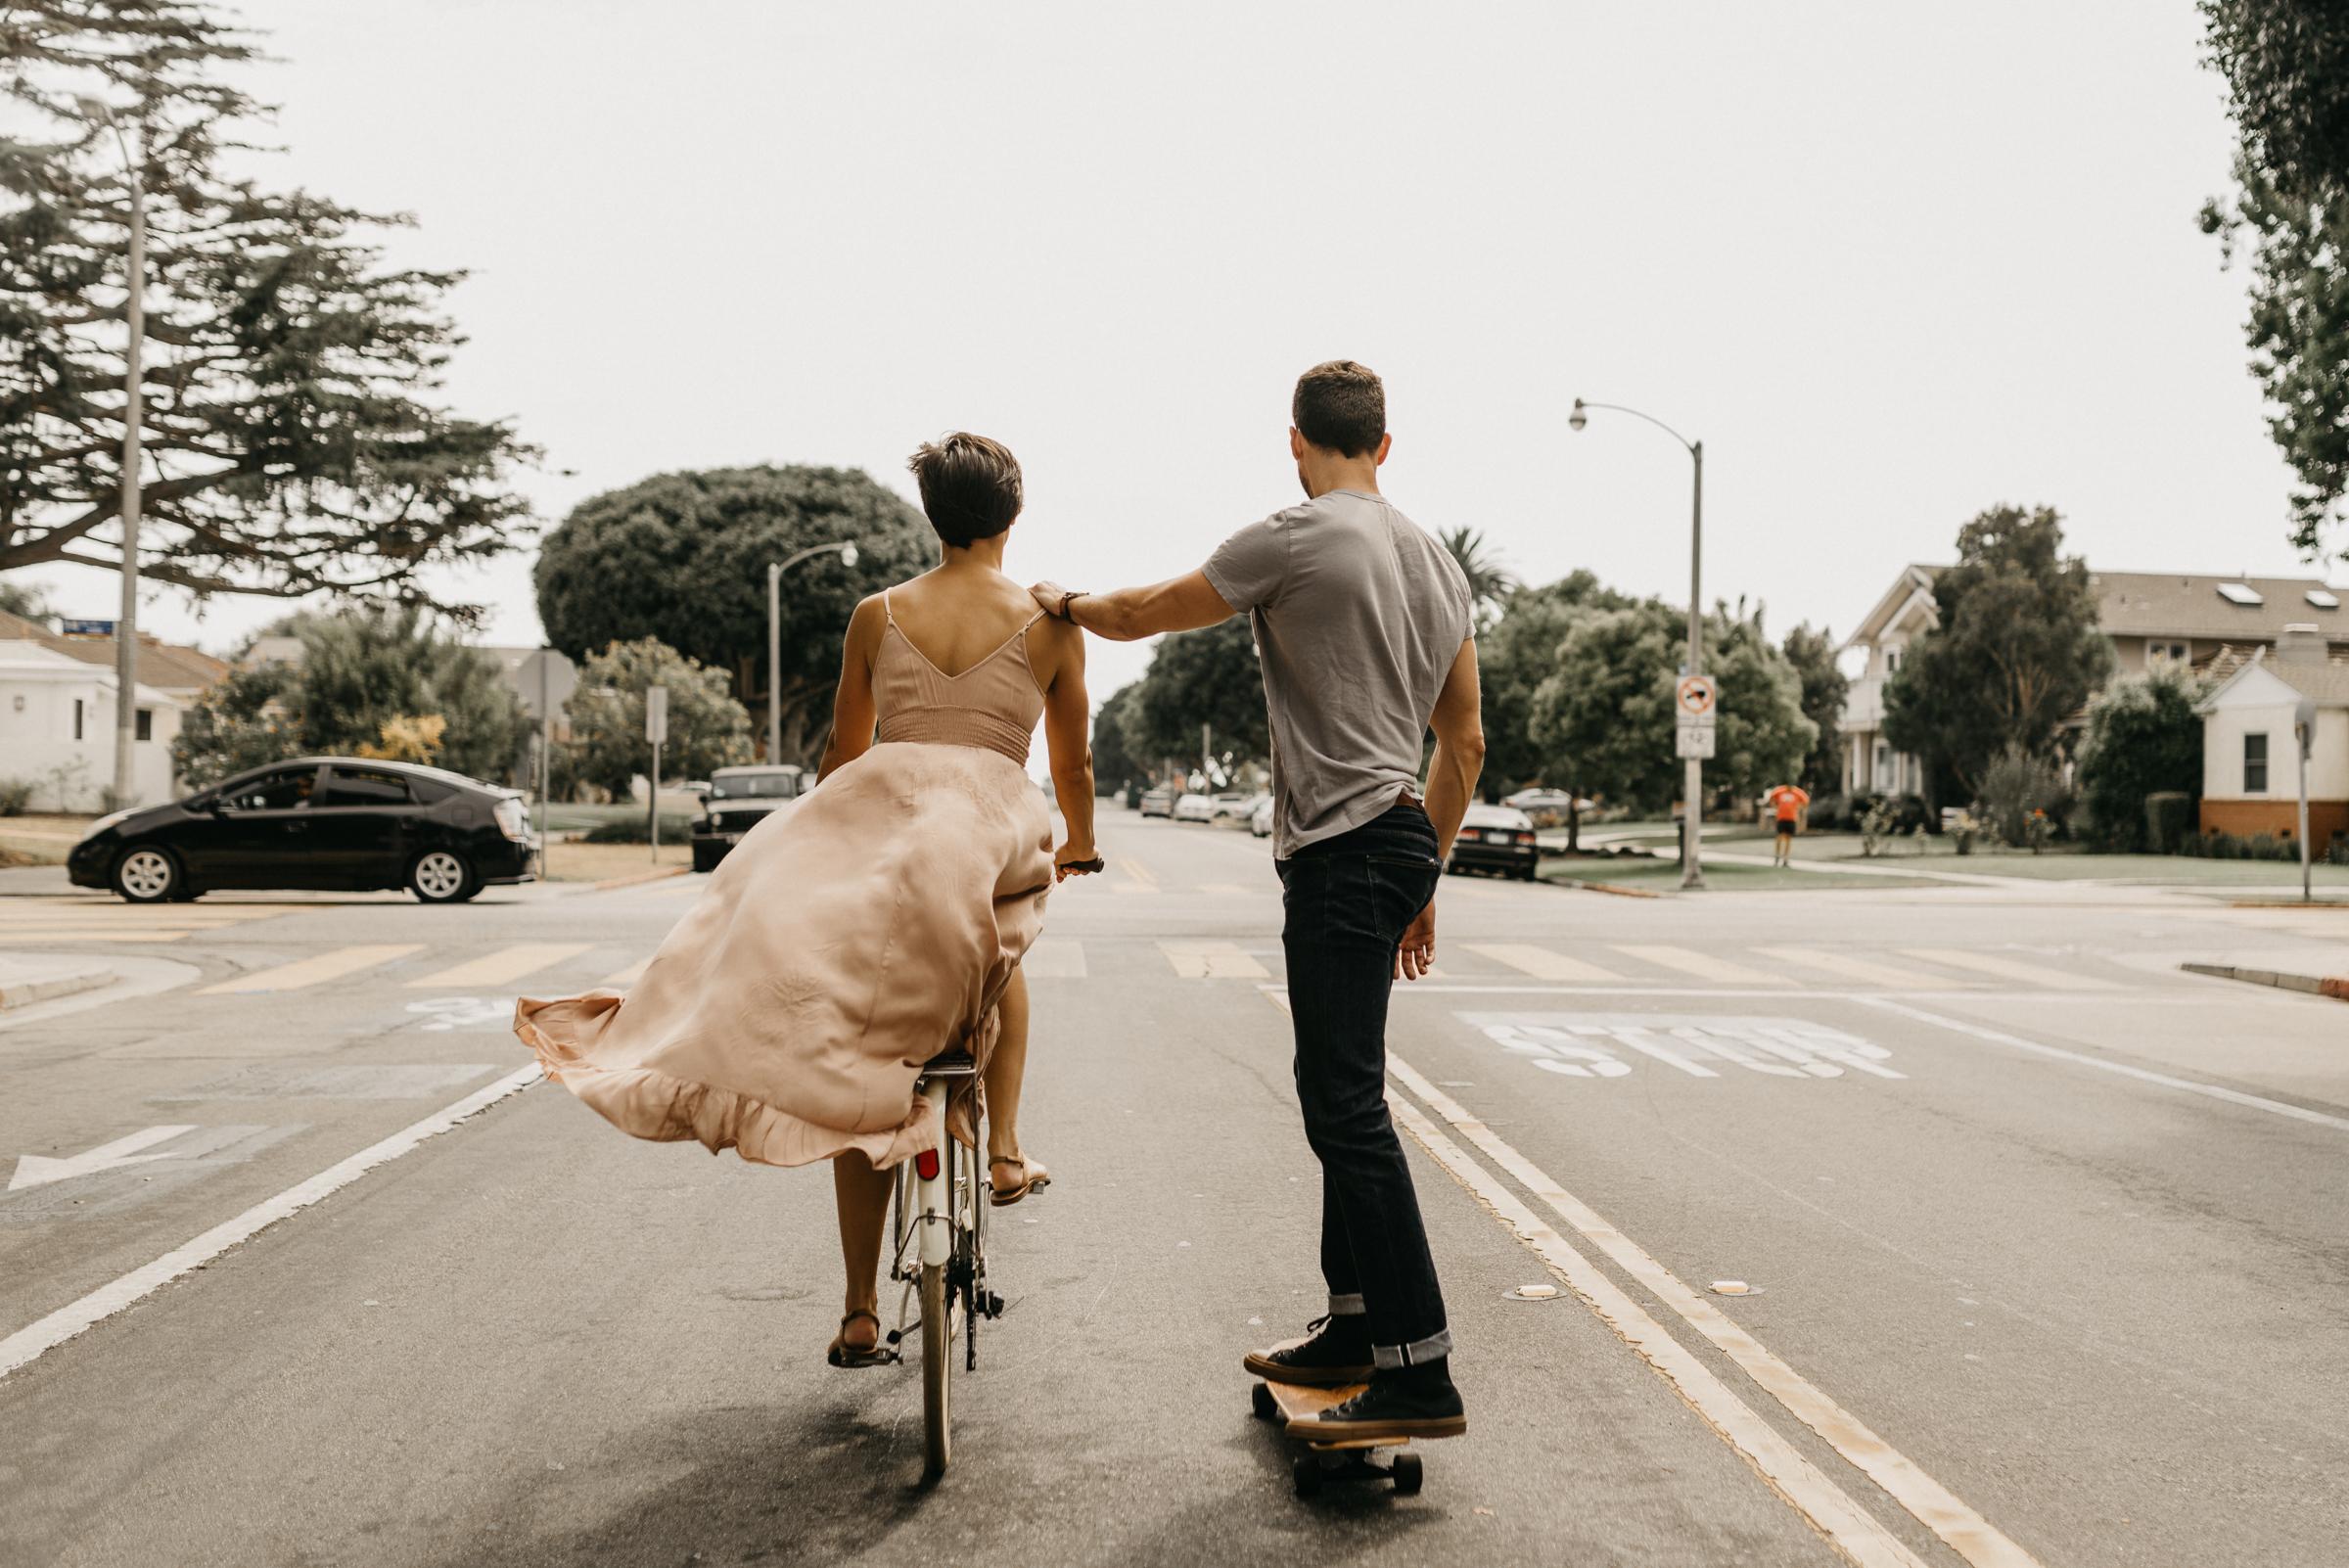 Isaiah + Taylor Photography - Venice Beach & Santa Monica Engagement Session, Los Angeles Wedding Photographer-013.jpg